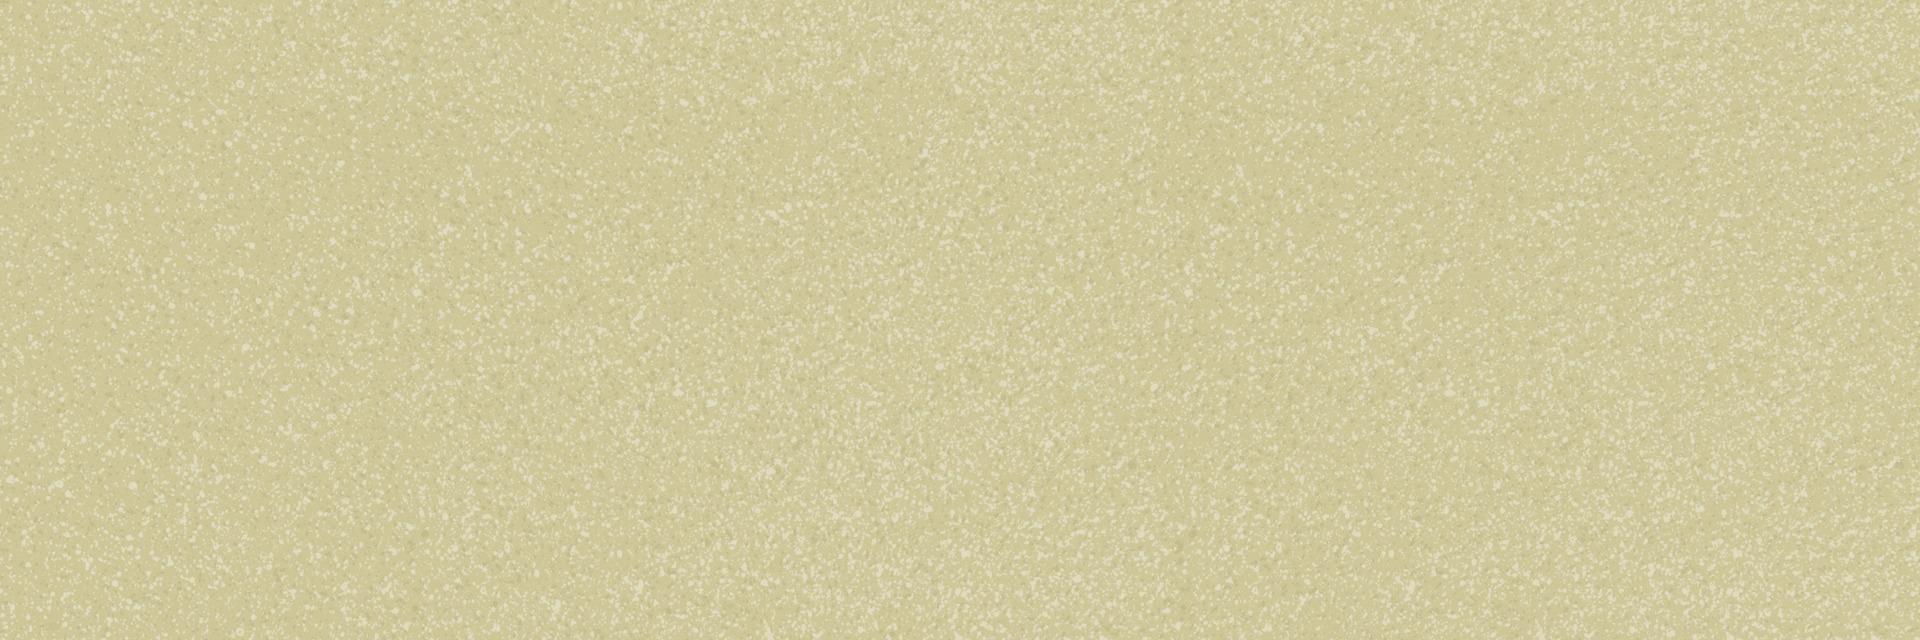 Granalt SNP Crema